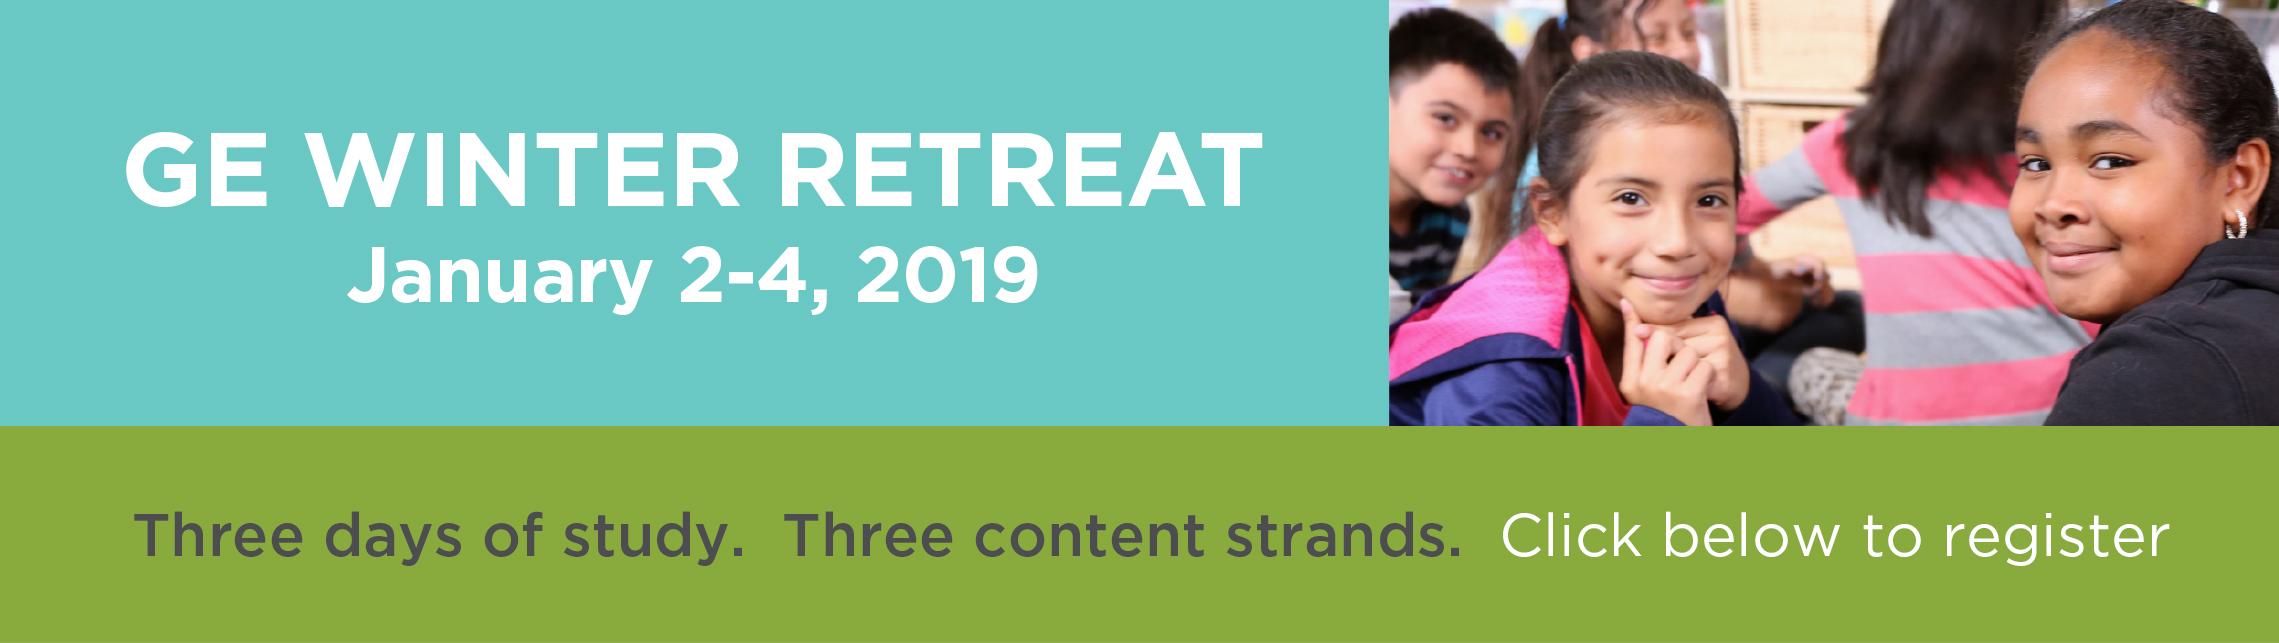 2019 GE Winter Retreat